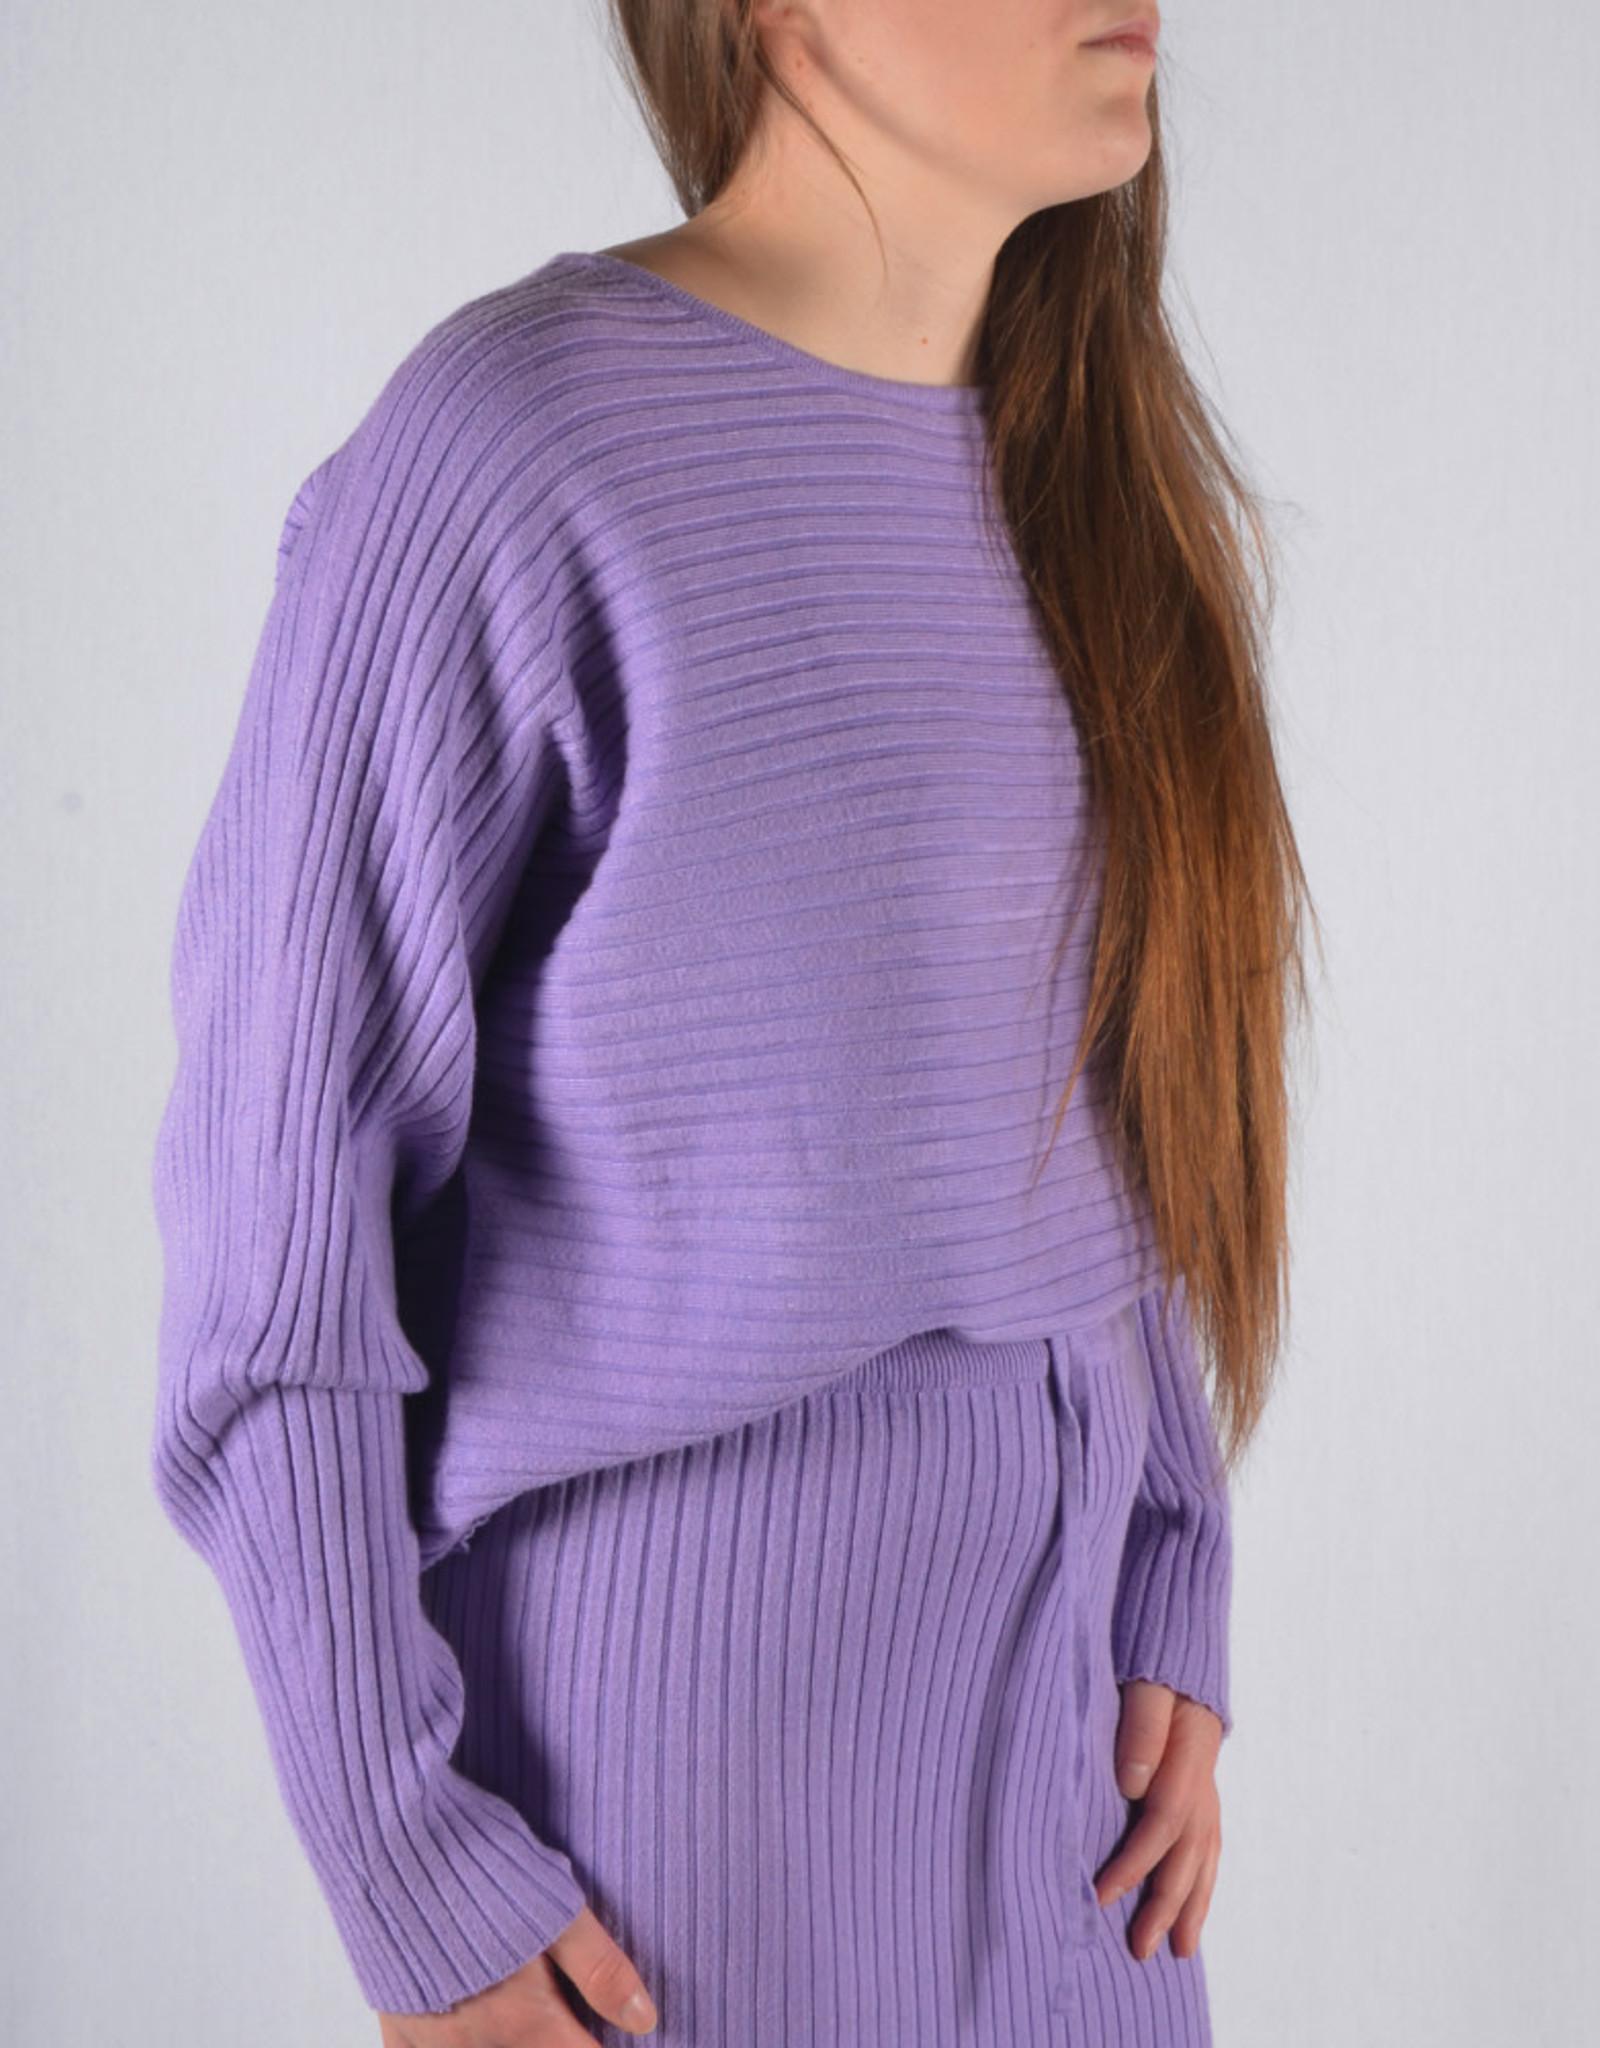 Rib homewear SET skirt & sweater lila one size